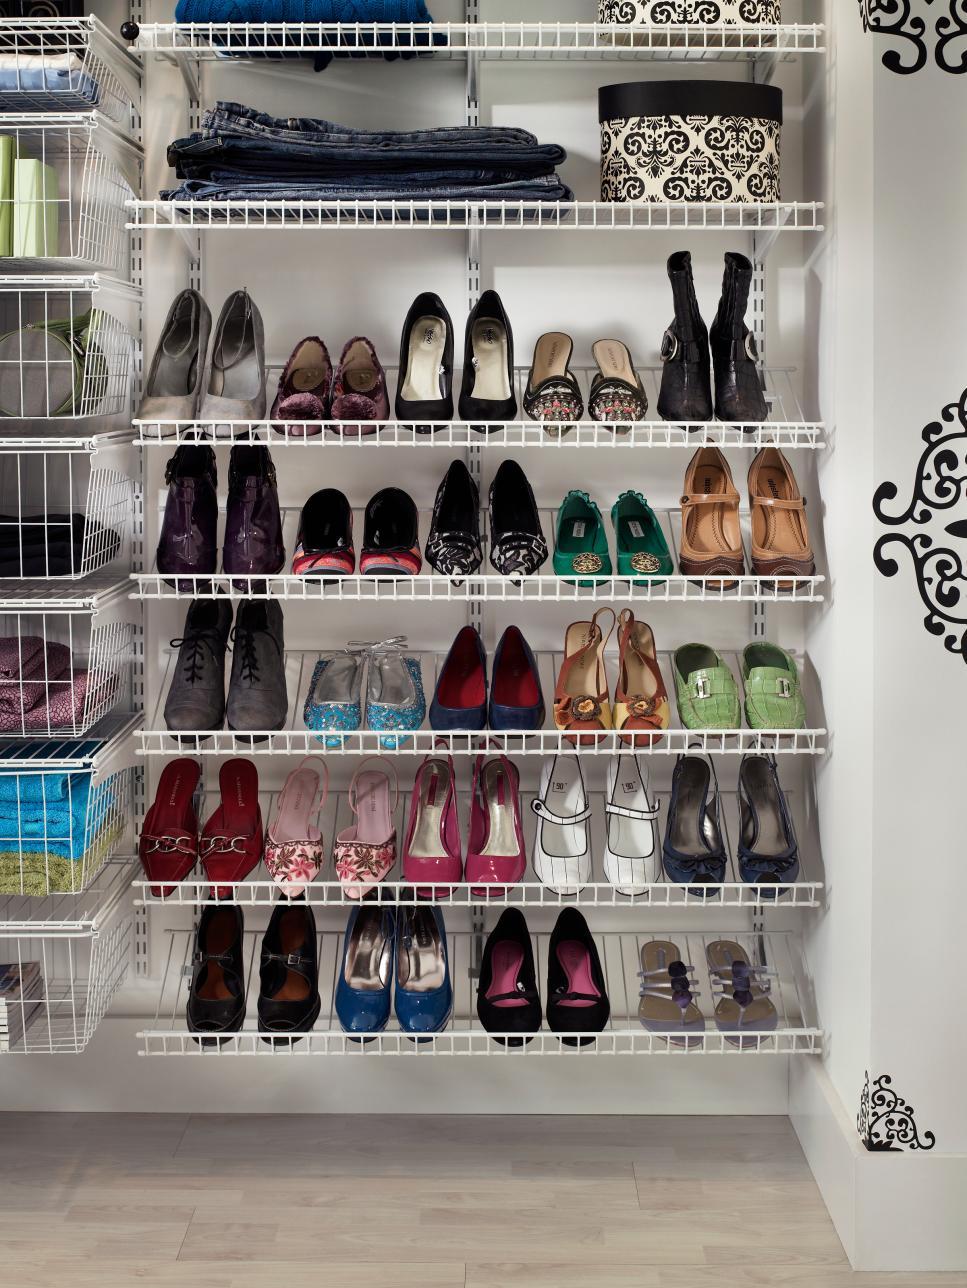 ci-closet-maid_shelf-track-white-reach-in-shoe-shelves_s3x4-jpg-rend-hgtvcom-966-1288